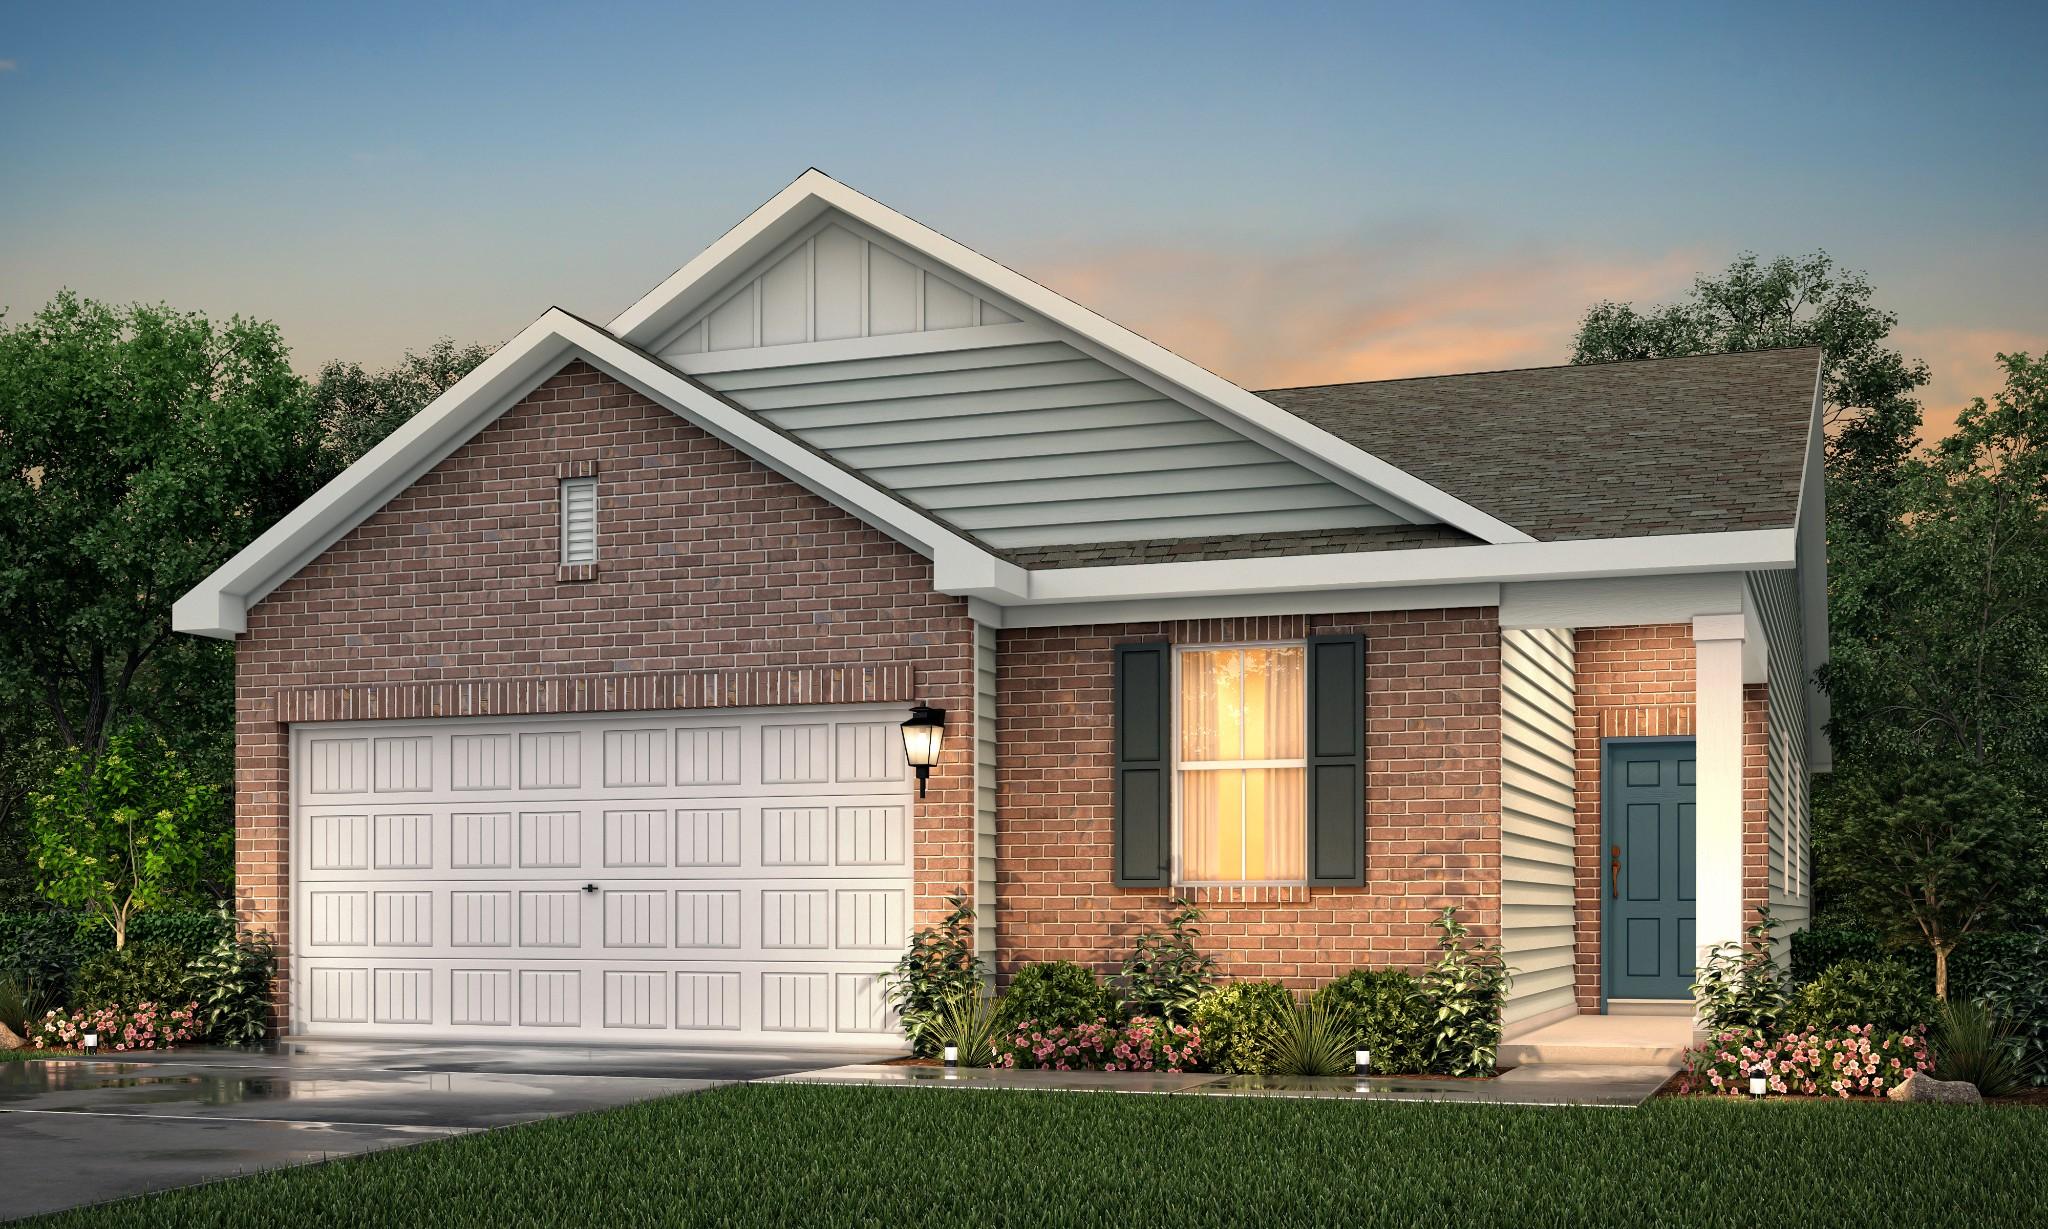 714 Amberton, Smyrna, TN 37167 - Smyrna, TN real estate listing